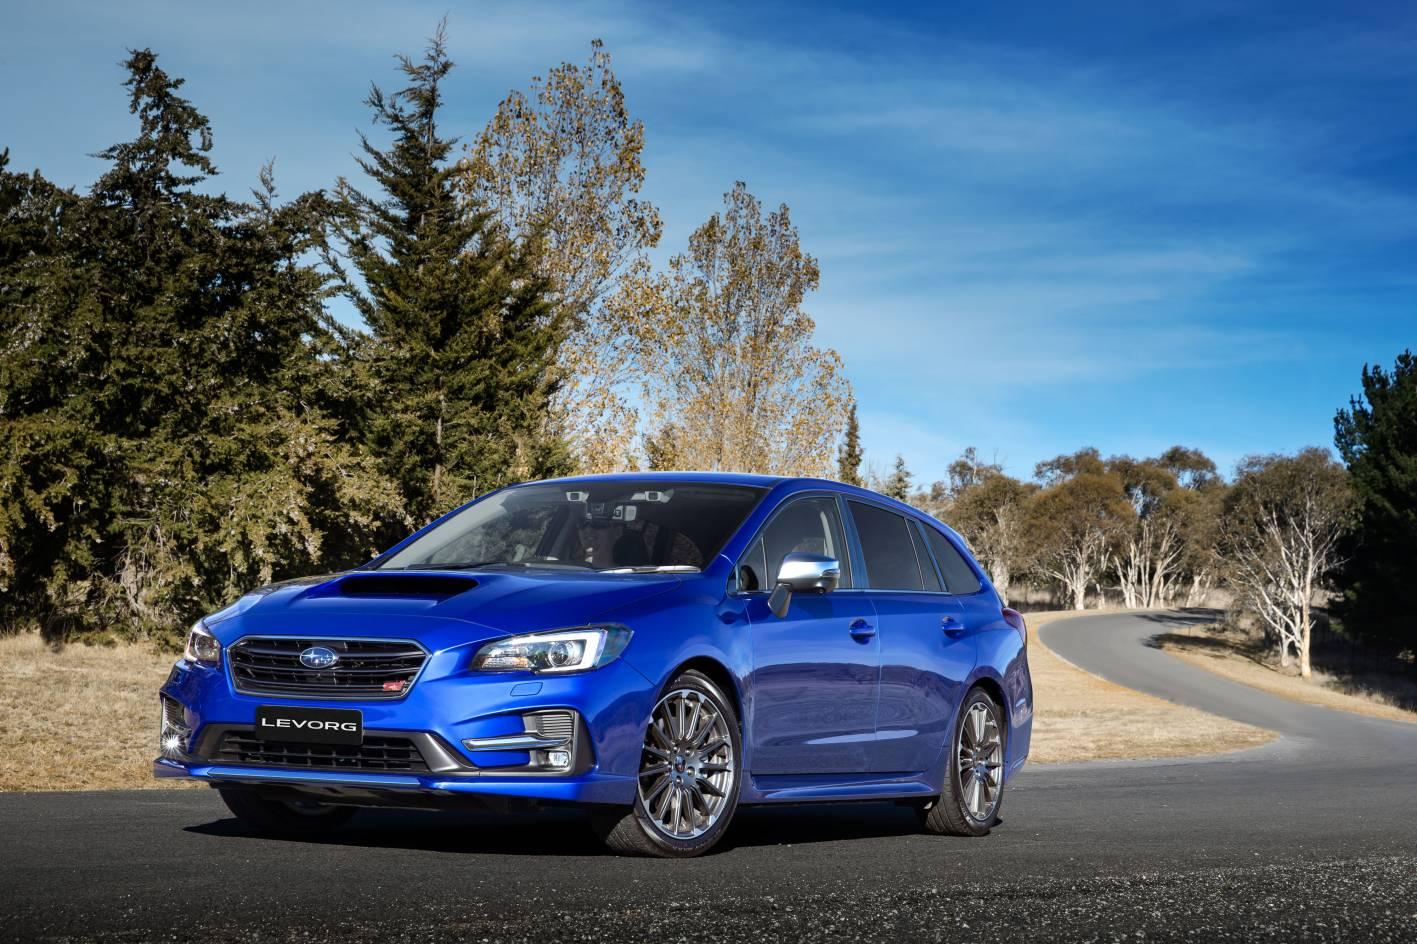 Subaru Outback Size Comparison >> Subaru Levorg 1.6L Turbo added as new range-opener - ForceGT.com